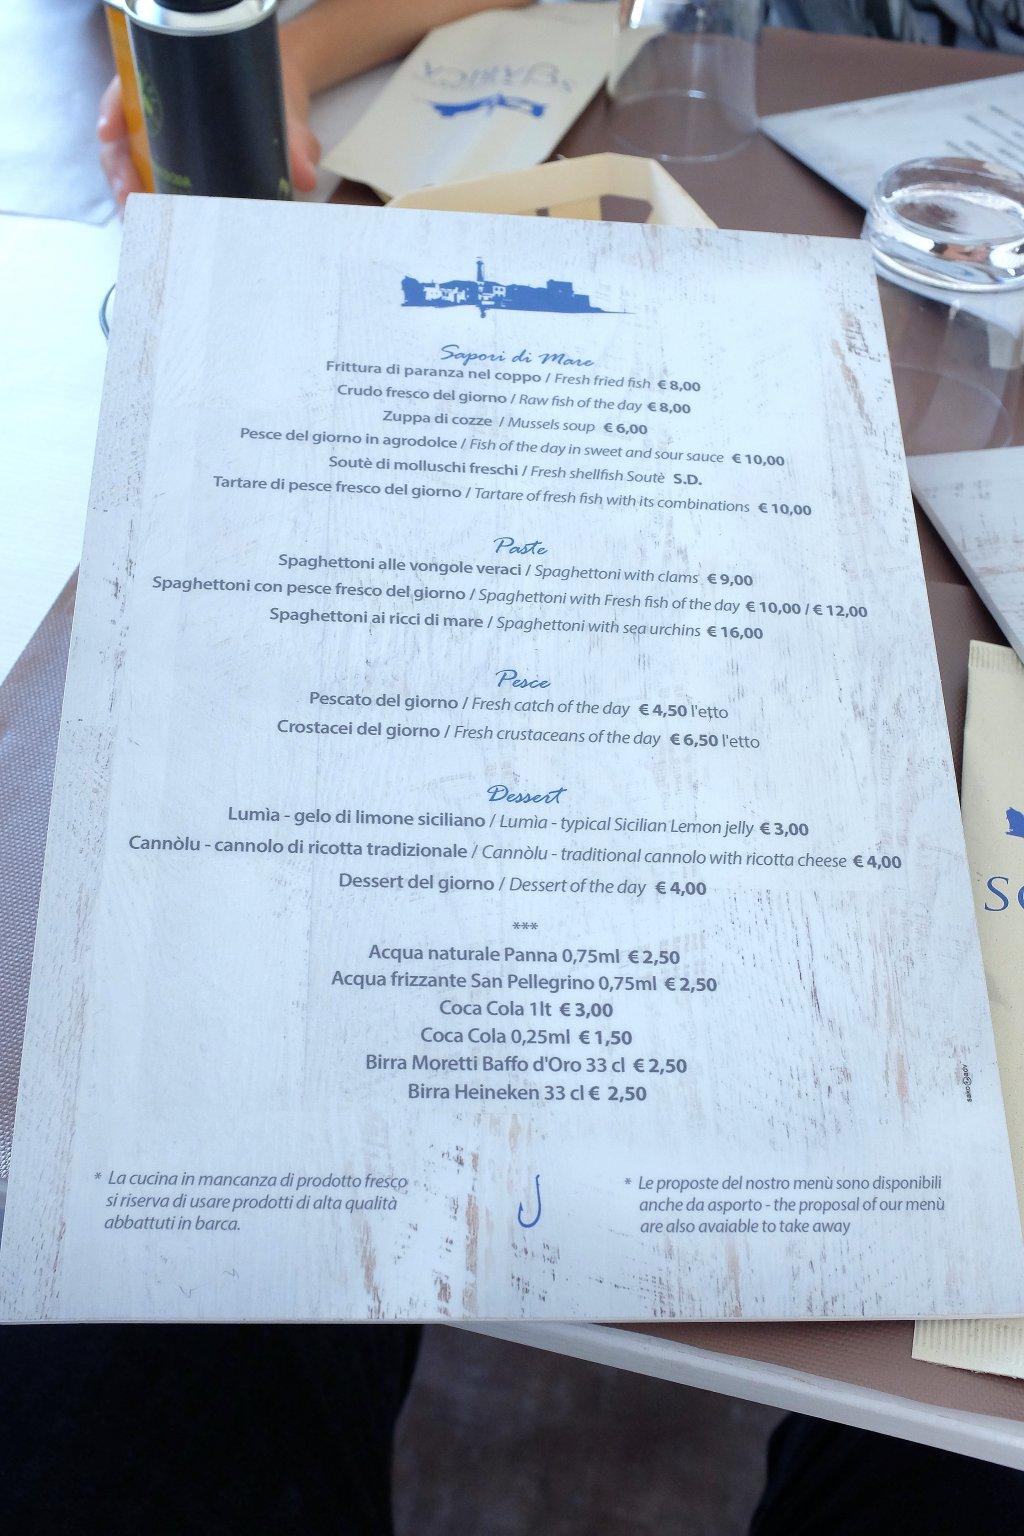 menù, Scjabica, Chef Joseph Micieli, Punta Secca, Santa Croce Camerina, Ragusa